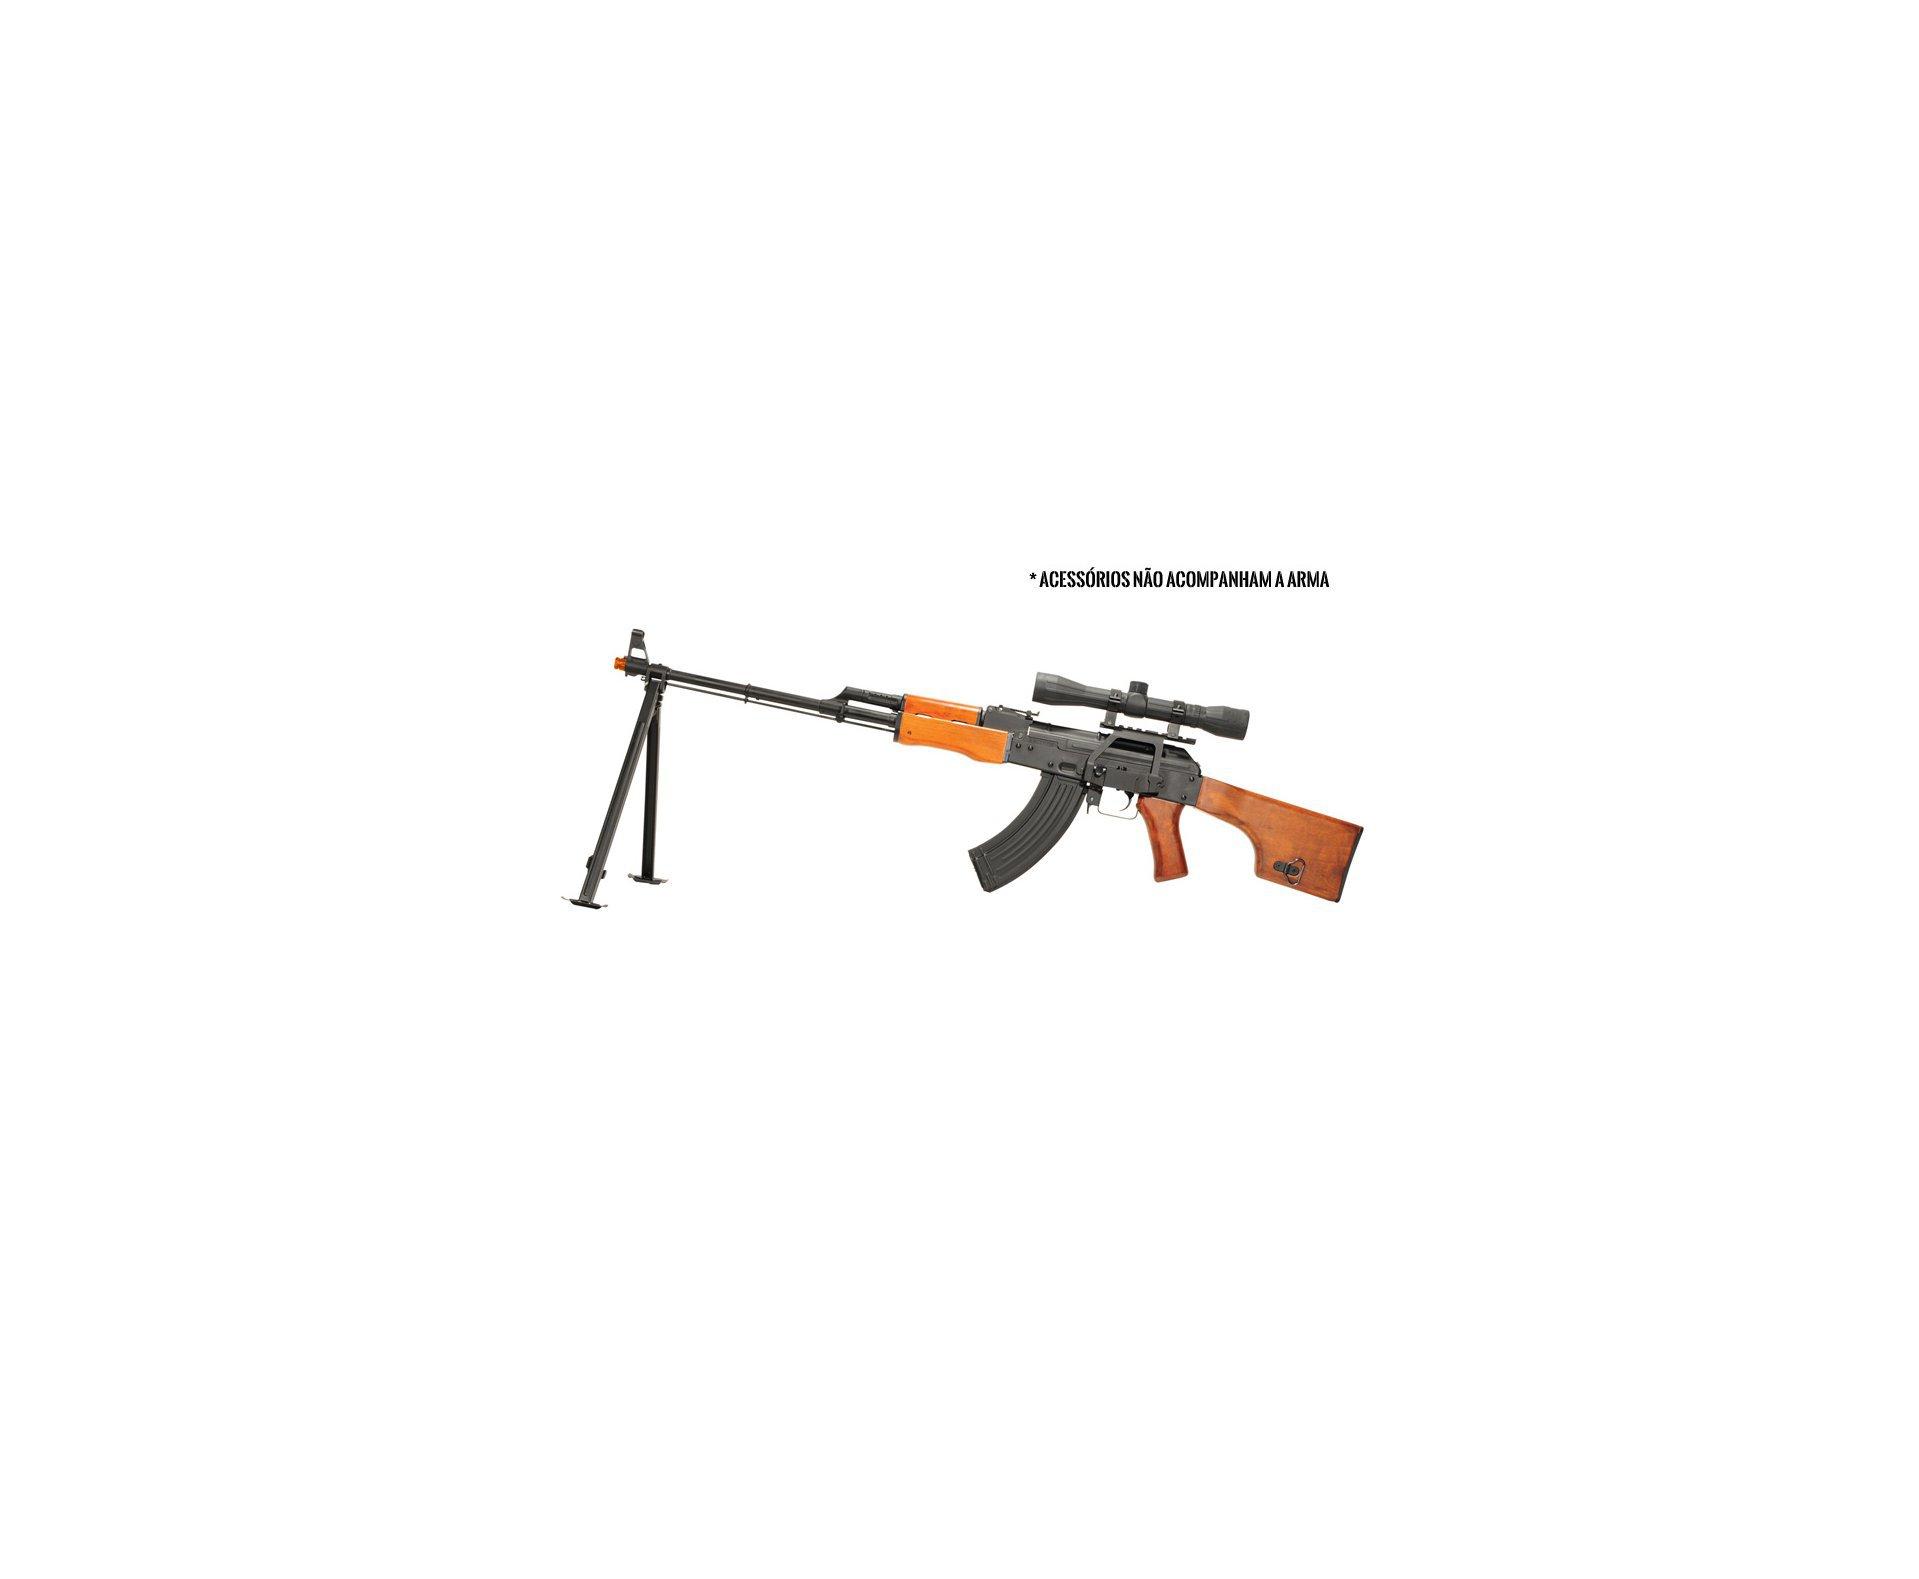 Rifle De Airsoft Kalashnikov Rpk-74 - Full Metal - Calibre 6,0 Mm - 220 V